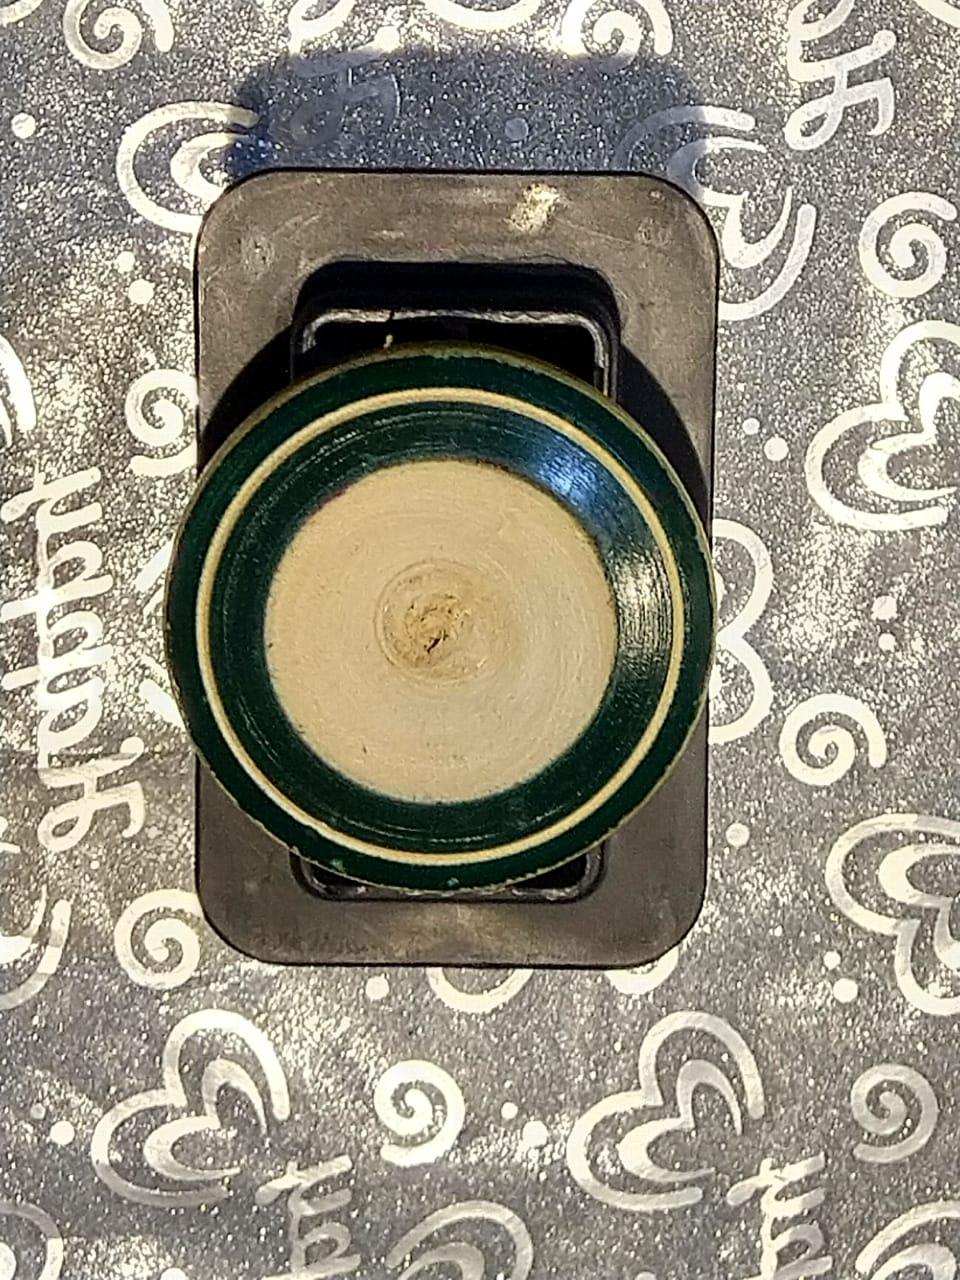 Lattu Hand Made Wooden Lattu with Rope Vintage Latto Spinner Top Vintage Beyblade